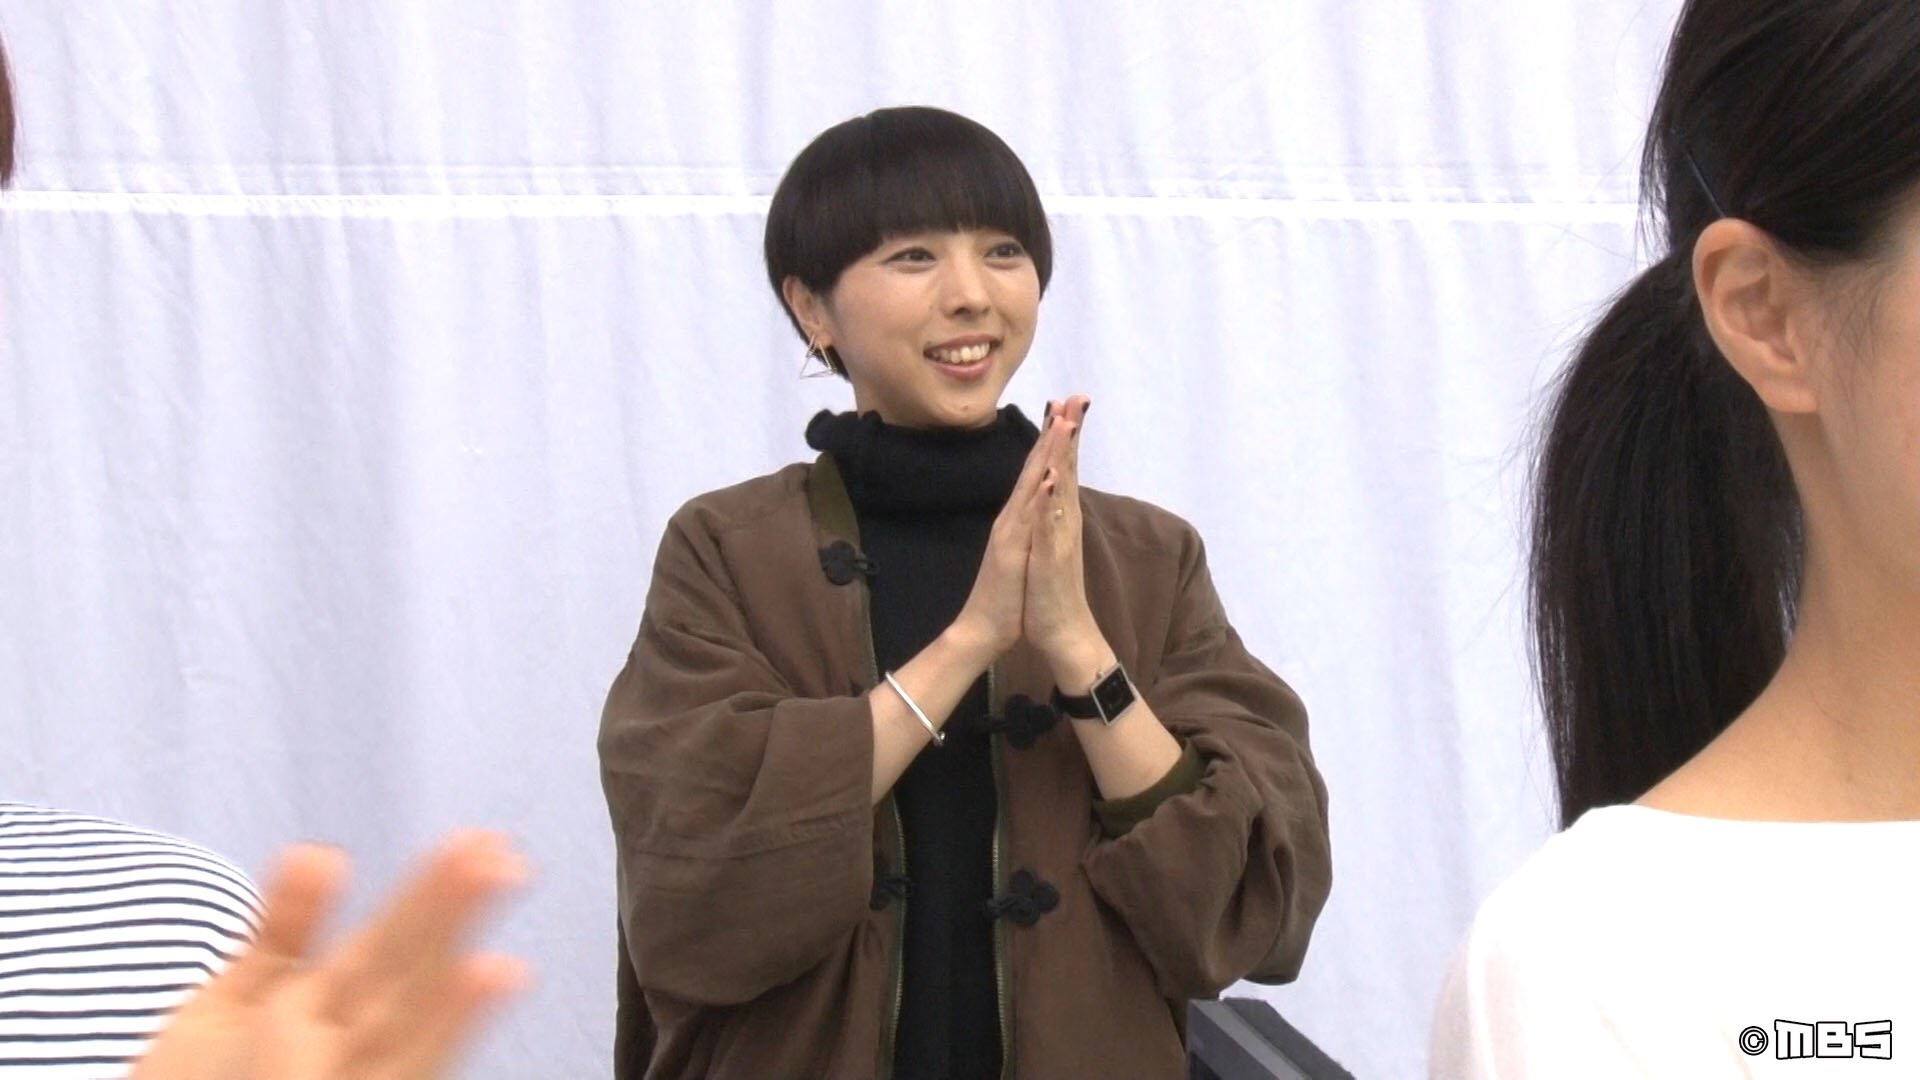 【MIKIKO先生】は恋ダンス、リオ五輪、Perfumeなどを手がけた最強振付師